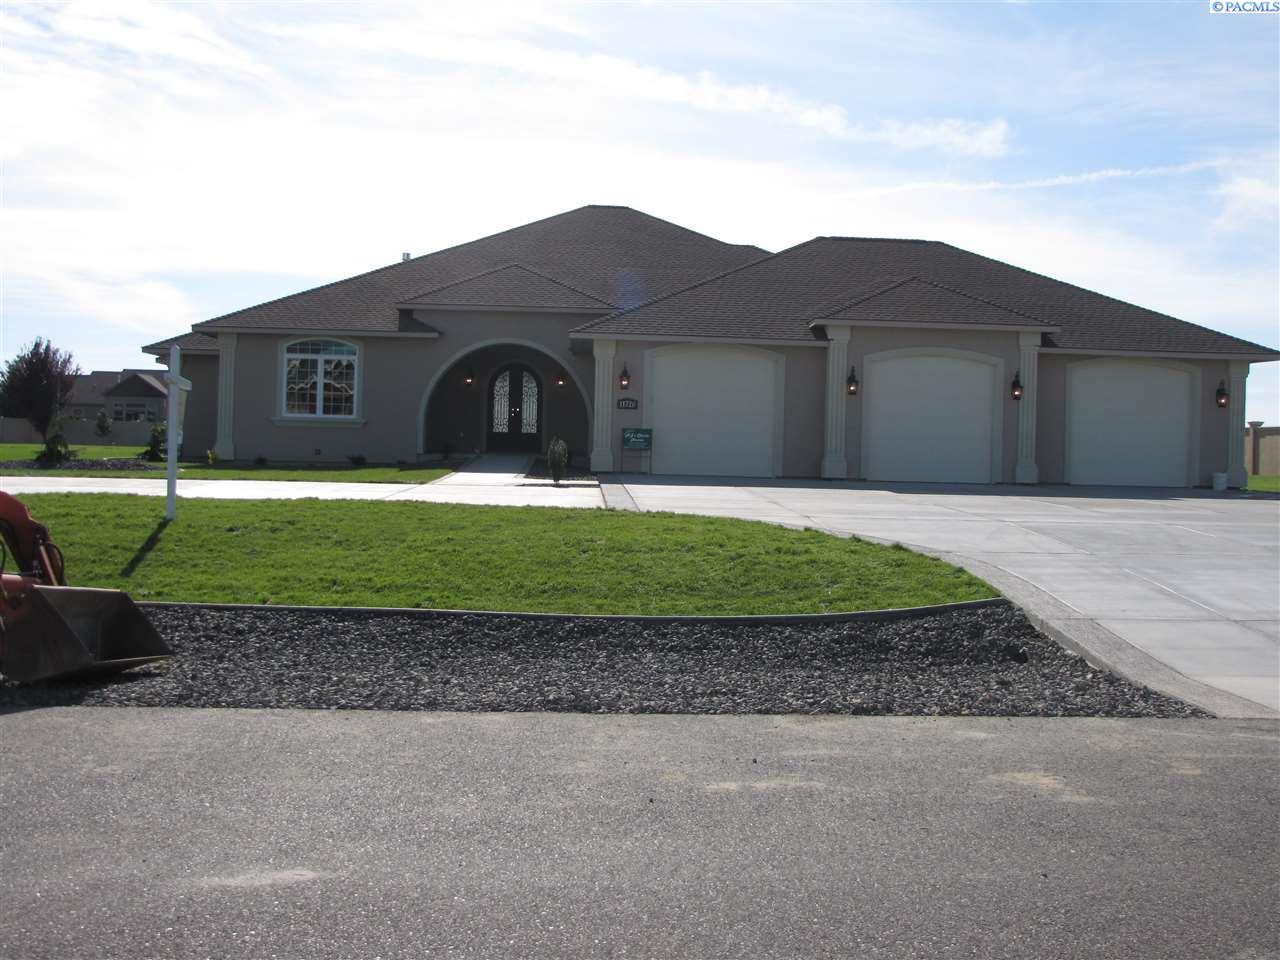 Single Family Home for Sale at 11720 Pheasant Run Road 11720 Pheasant Run Road Pasco, Washington 99301 United States